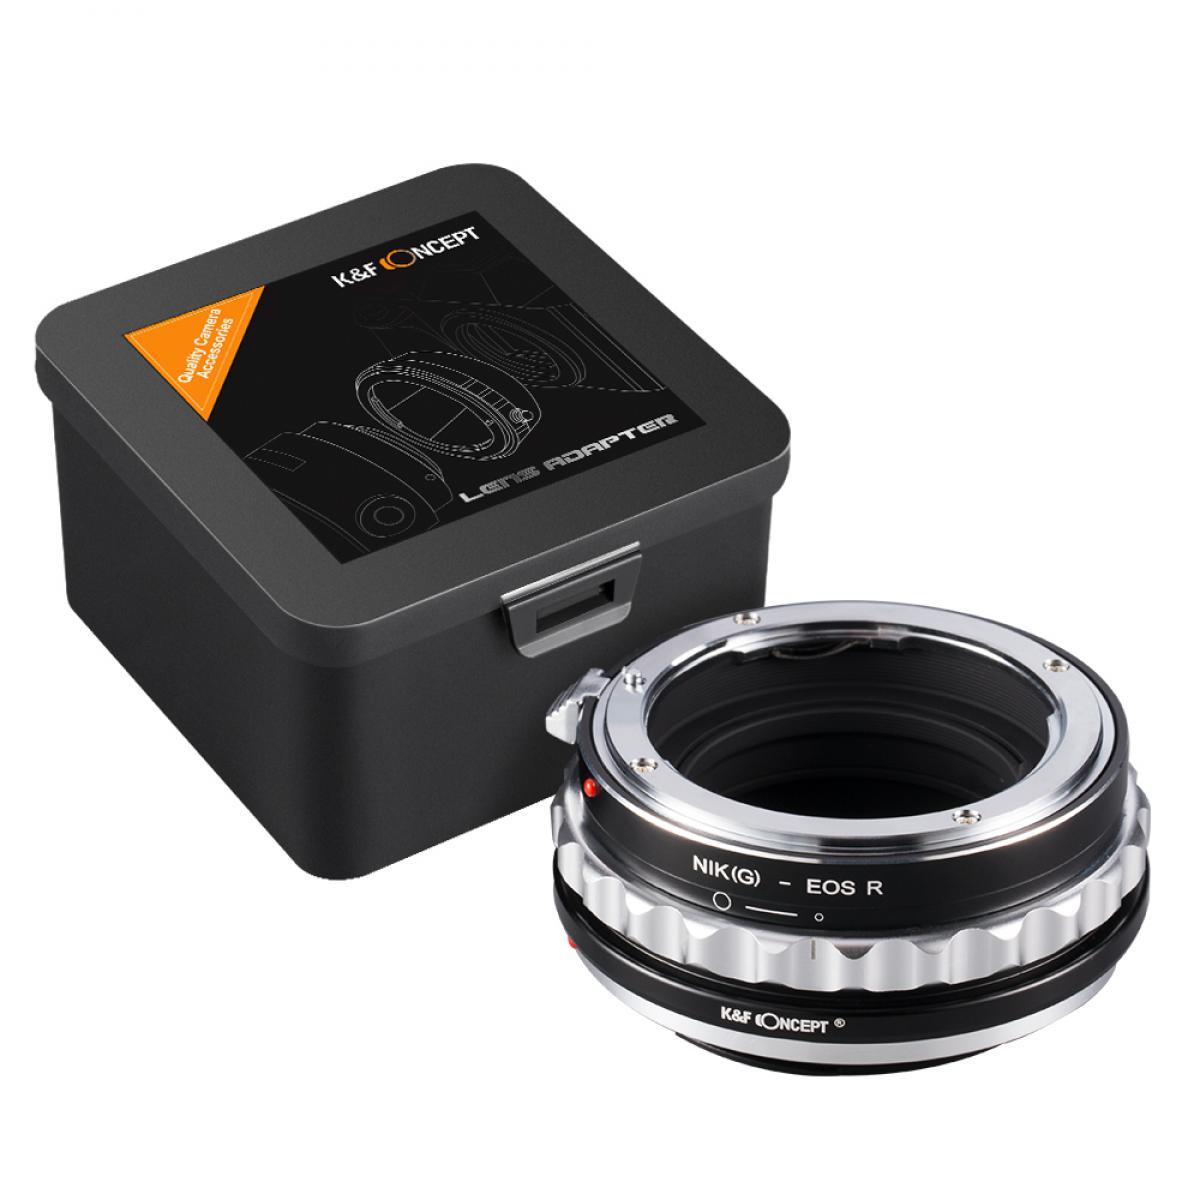 K&F M18194 Nikon G Lenses to Canon EOS R Lens Mount Adapter